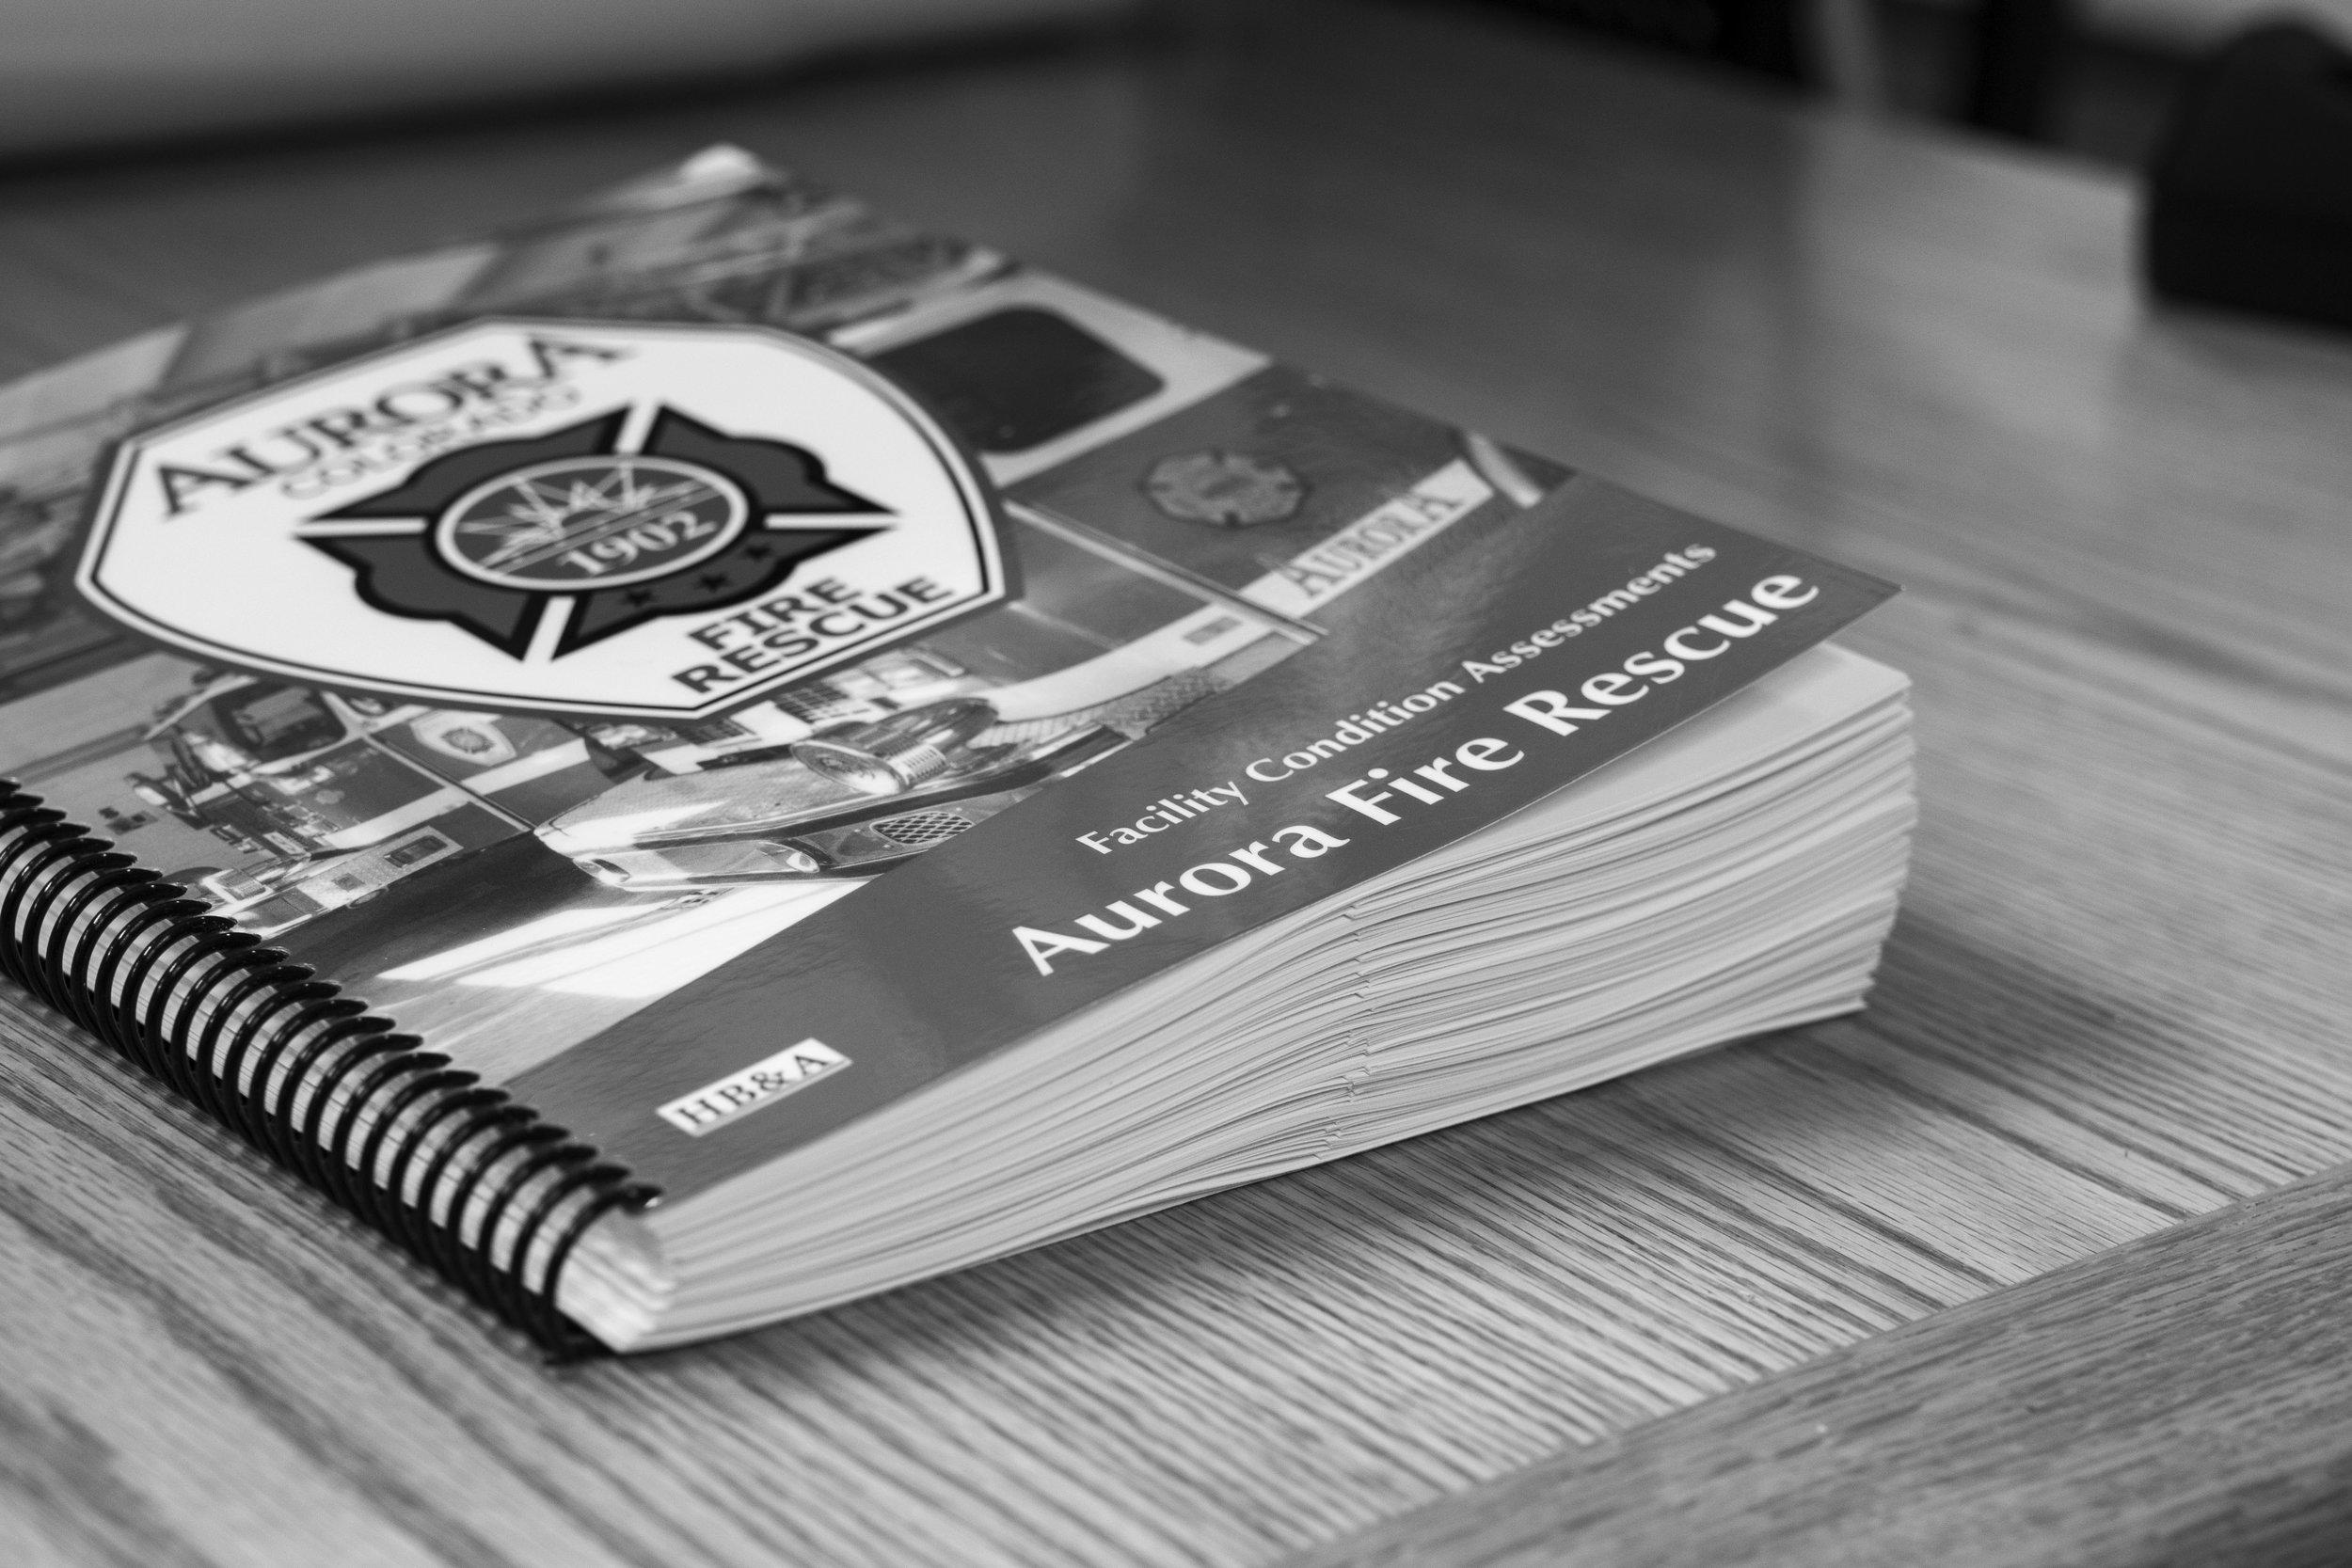 Aurora book.bw.jpg